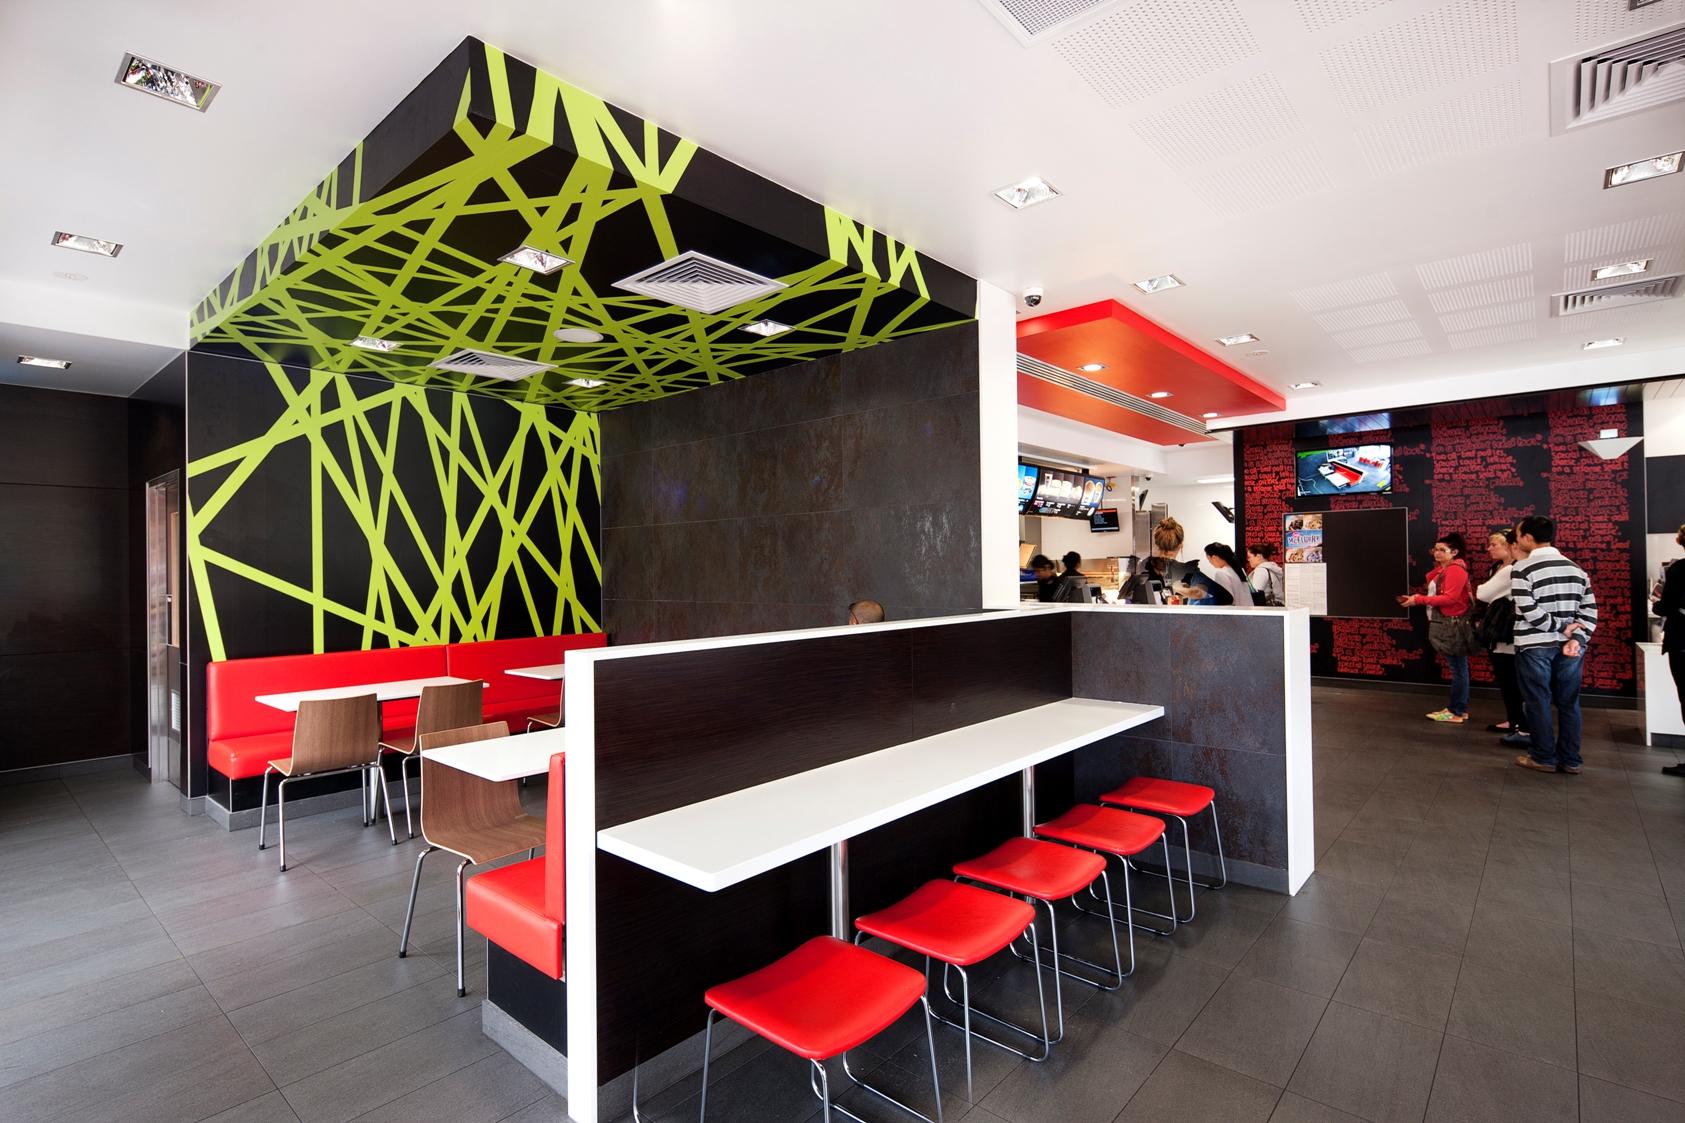 McDonalds20111027_1585 small.jpg